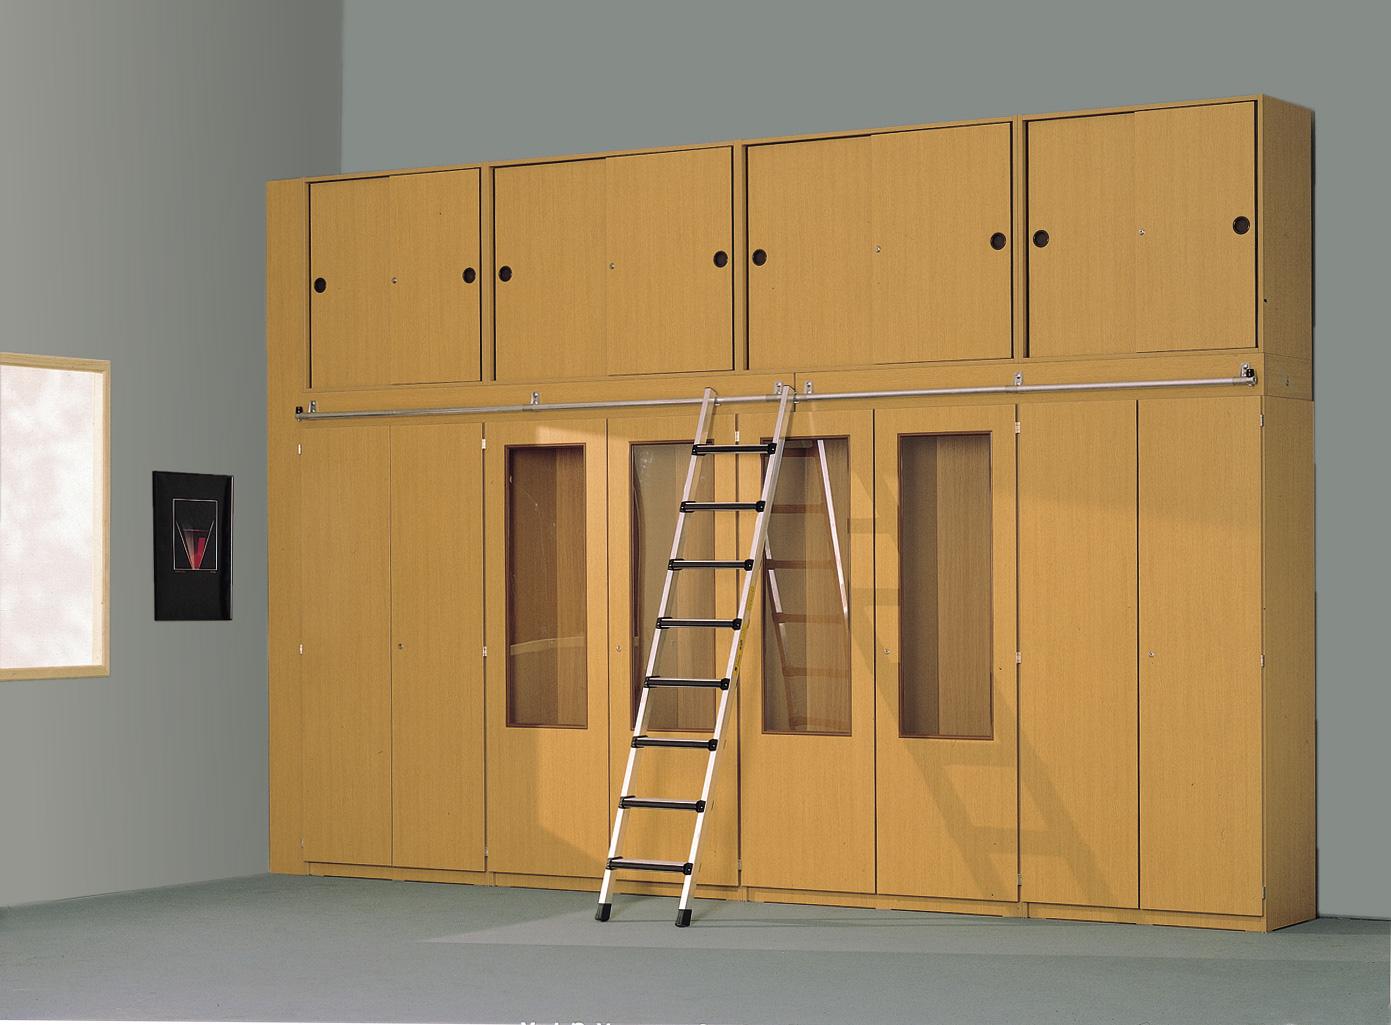 zarge mit f hrungsrohr f einh nge leiter preis pro lfd meter lms lehrmittel service h sp th gmbh. Black Bedroom Furniture Sets. Home Design Ideas